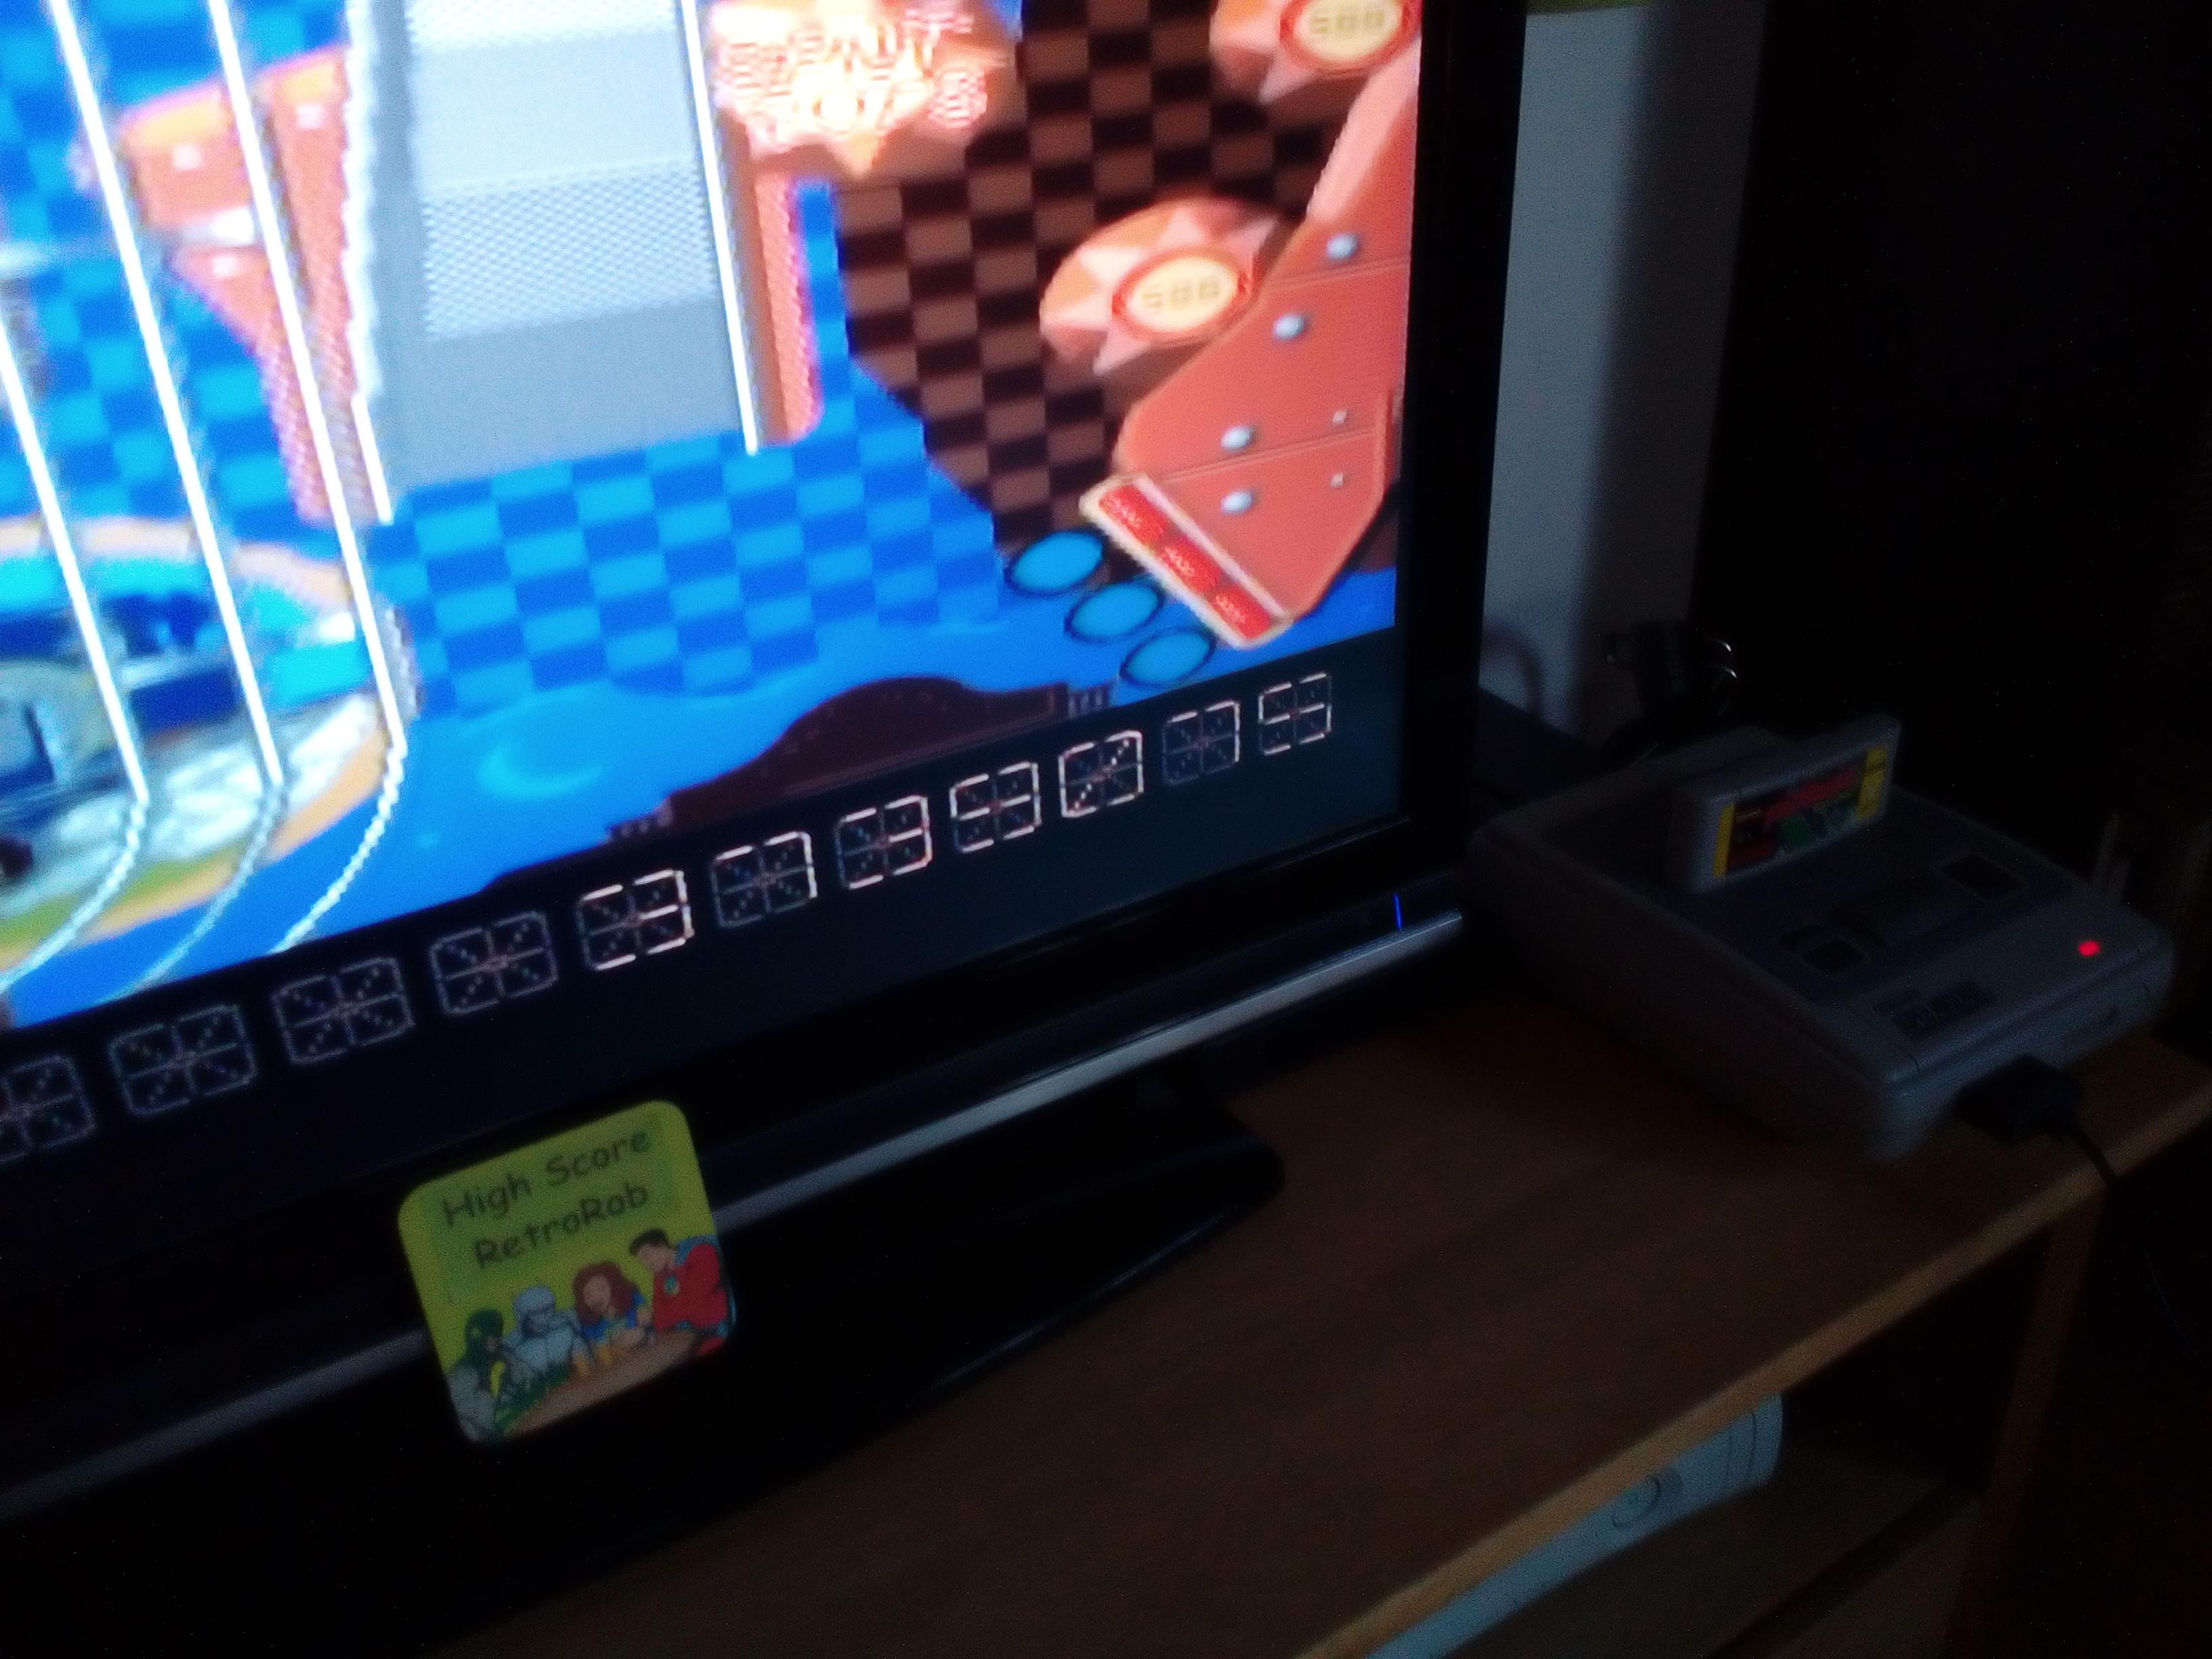 RetroRob: Pinball Dreams: Steel Wheel (SNES/Super Famicom) 3,739,075 points on 2018-05-07 13:52:39